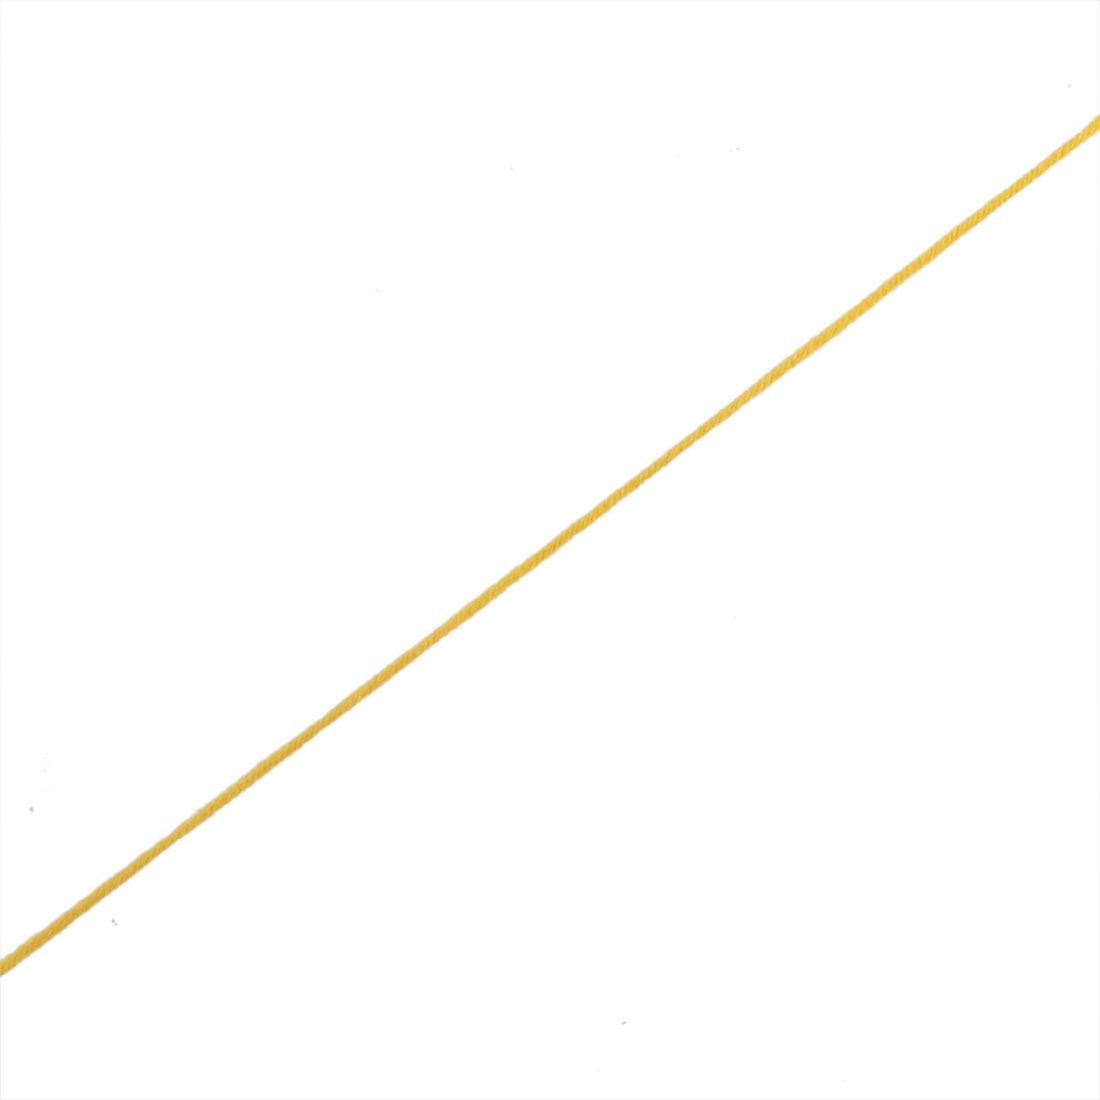 DIY Shawl Scarf Hat Glove Cord Tatting Knitting Weaving Yarn Yellow 100g 2pcs - image 1 of 3